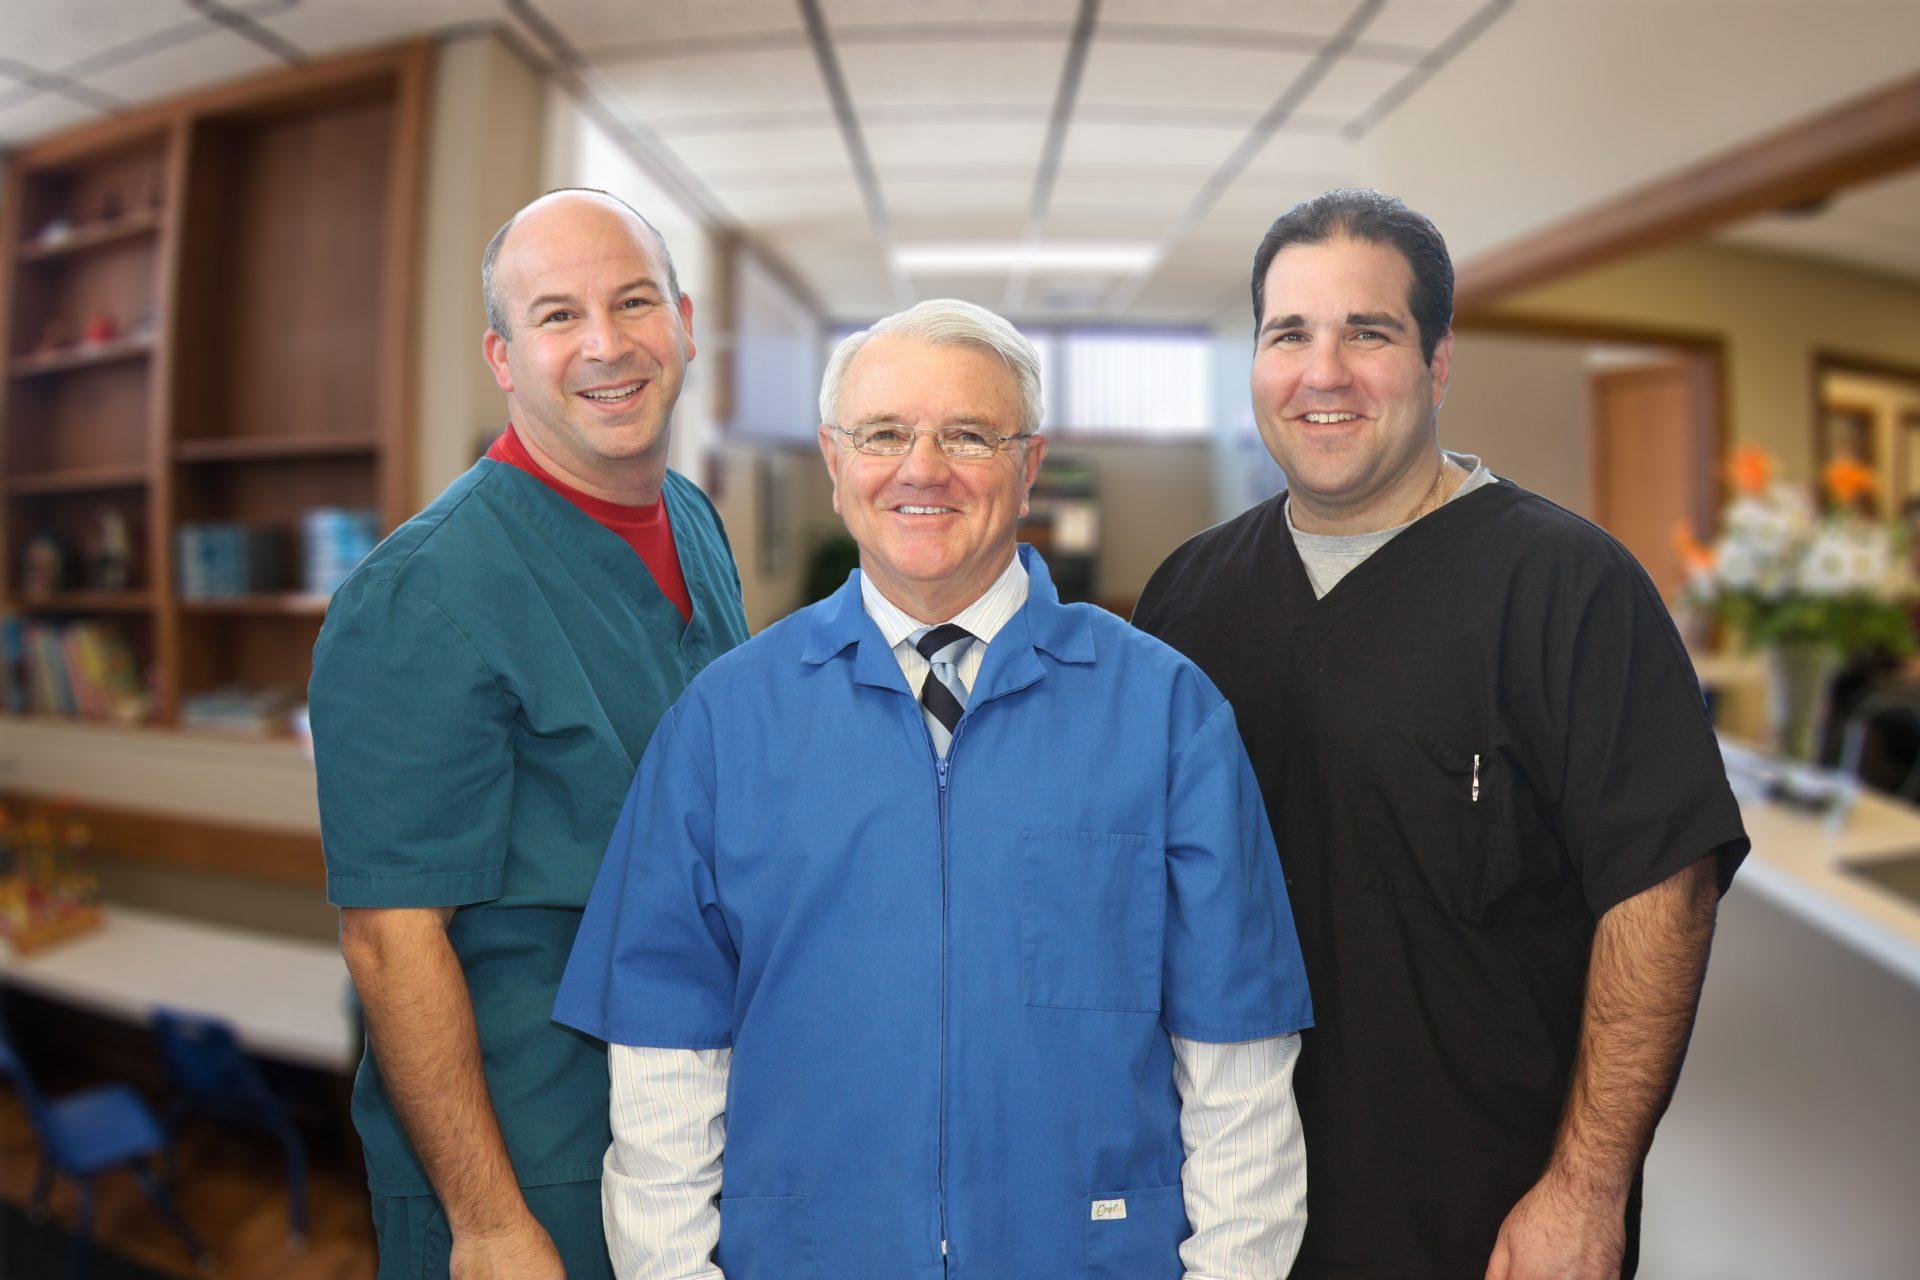 the best dentist in kenosha, best kenosha dentists, sps dental